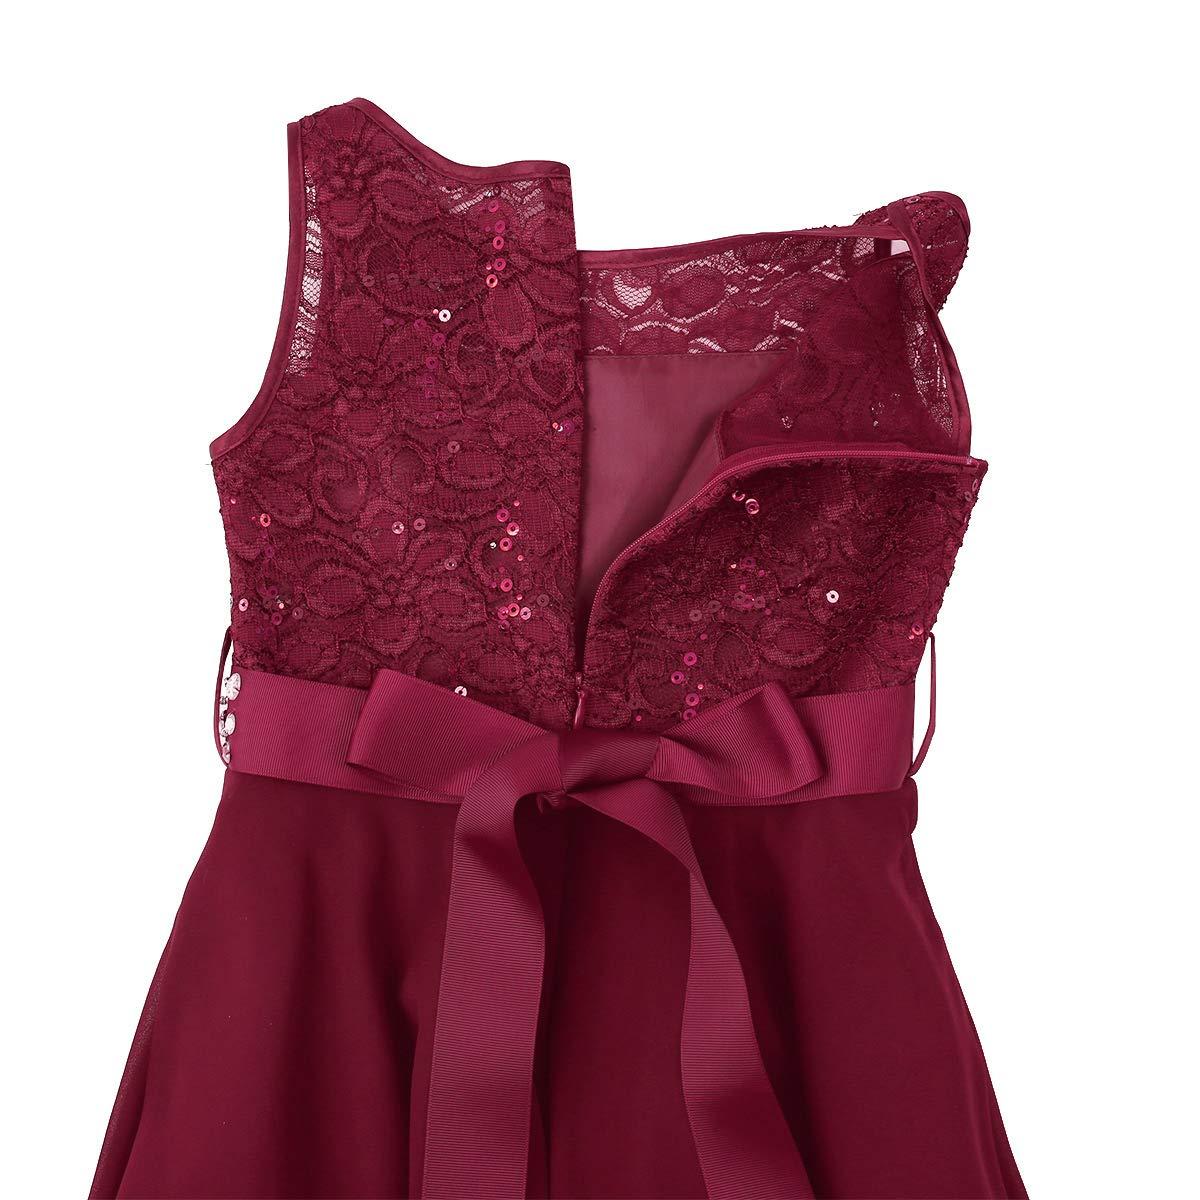 CHICTRY Kids Girls Sparkle Belt Sequin Lace Flower Girl Bridesmaid Wedding Party Dresses